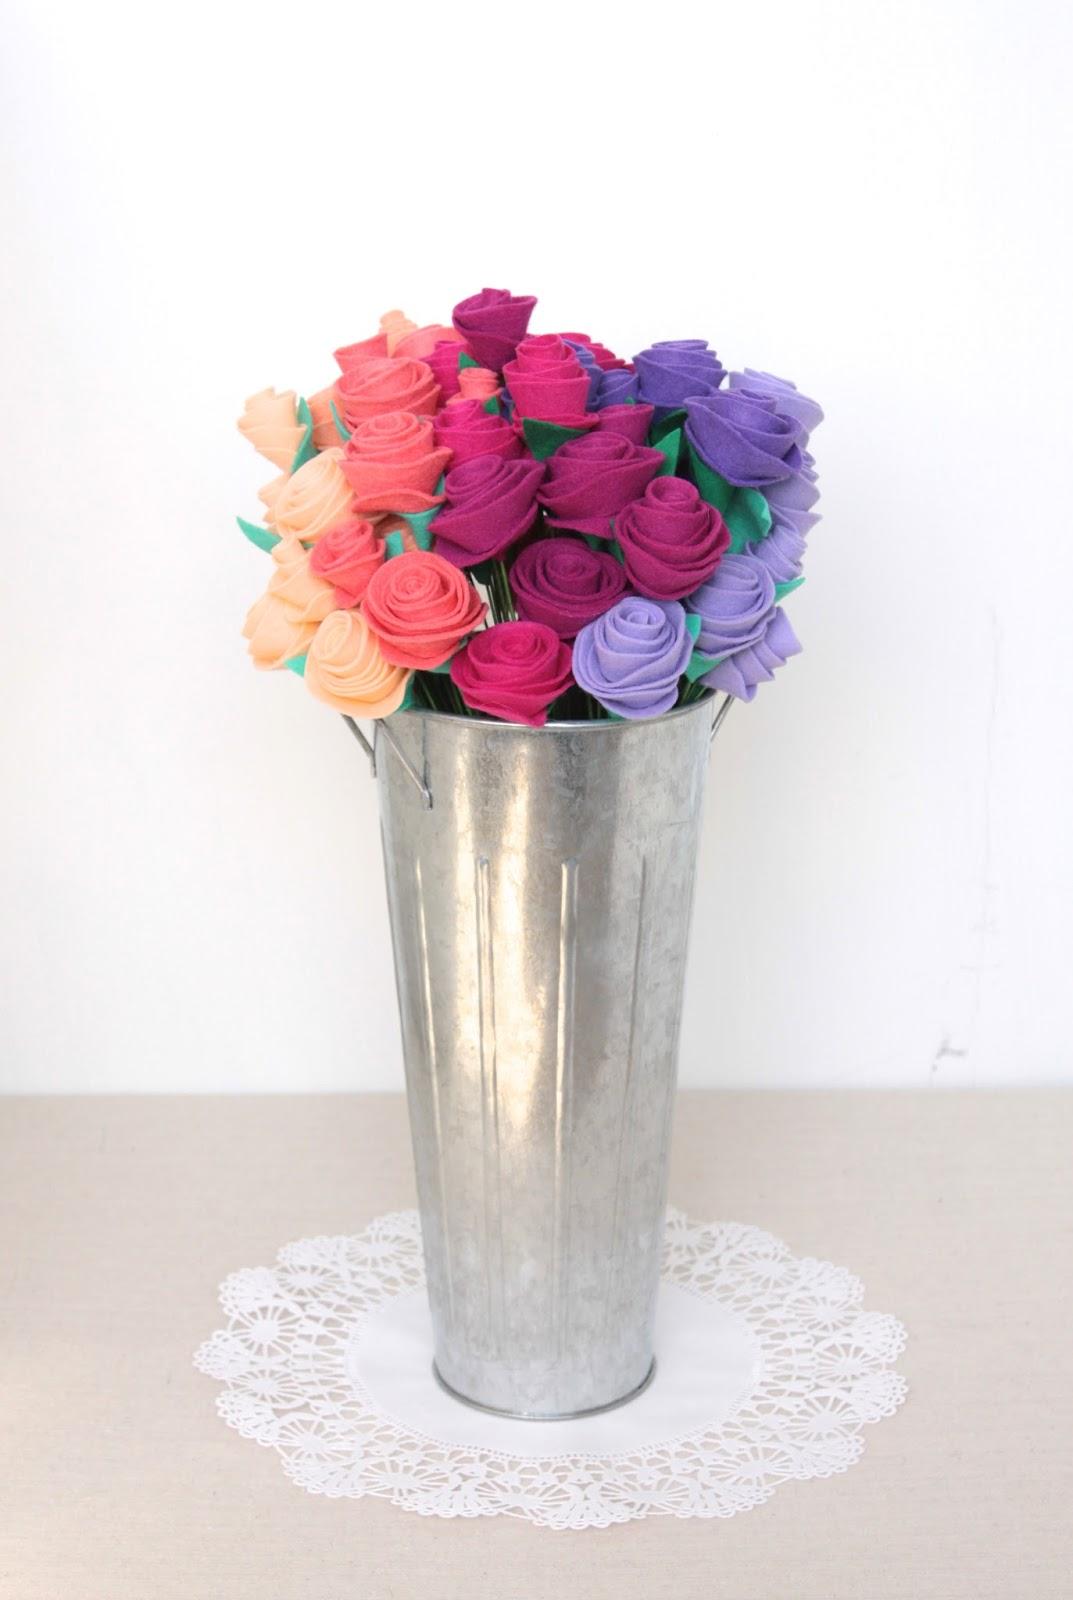 Felt Bouquet How-to // Benzie